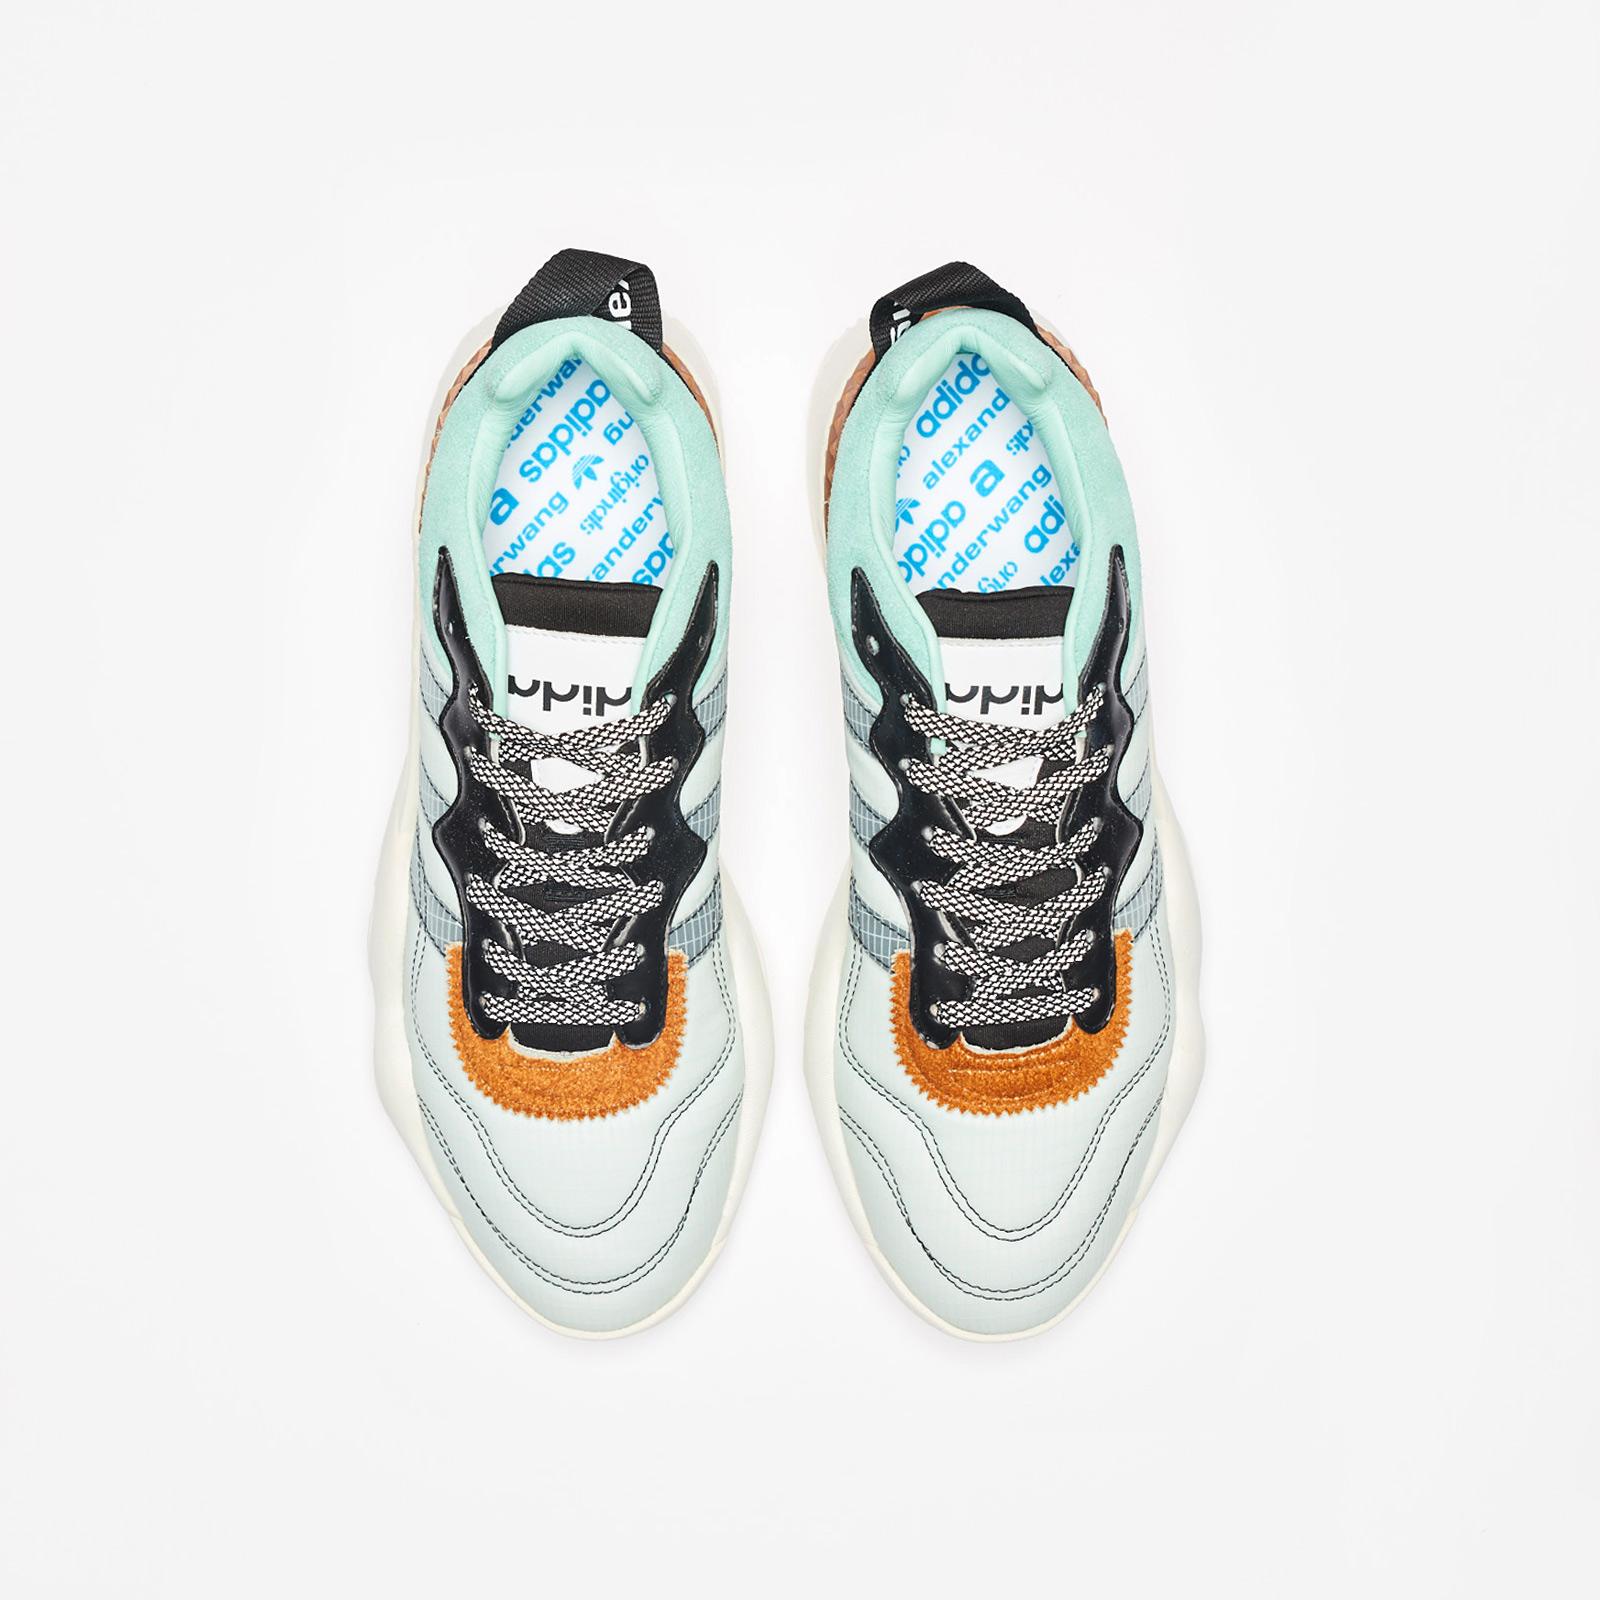 90772c056cd adidas Originals by Alexander Wang AW Turnout Trainer - 7. Close